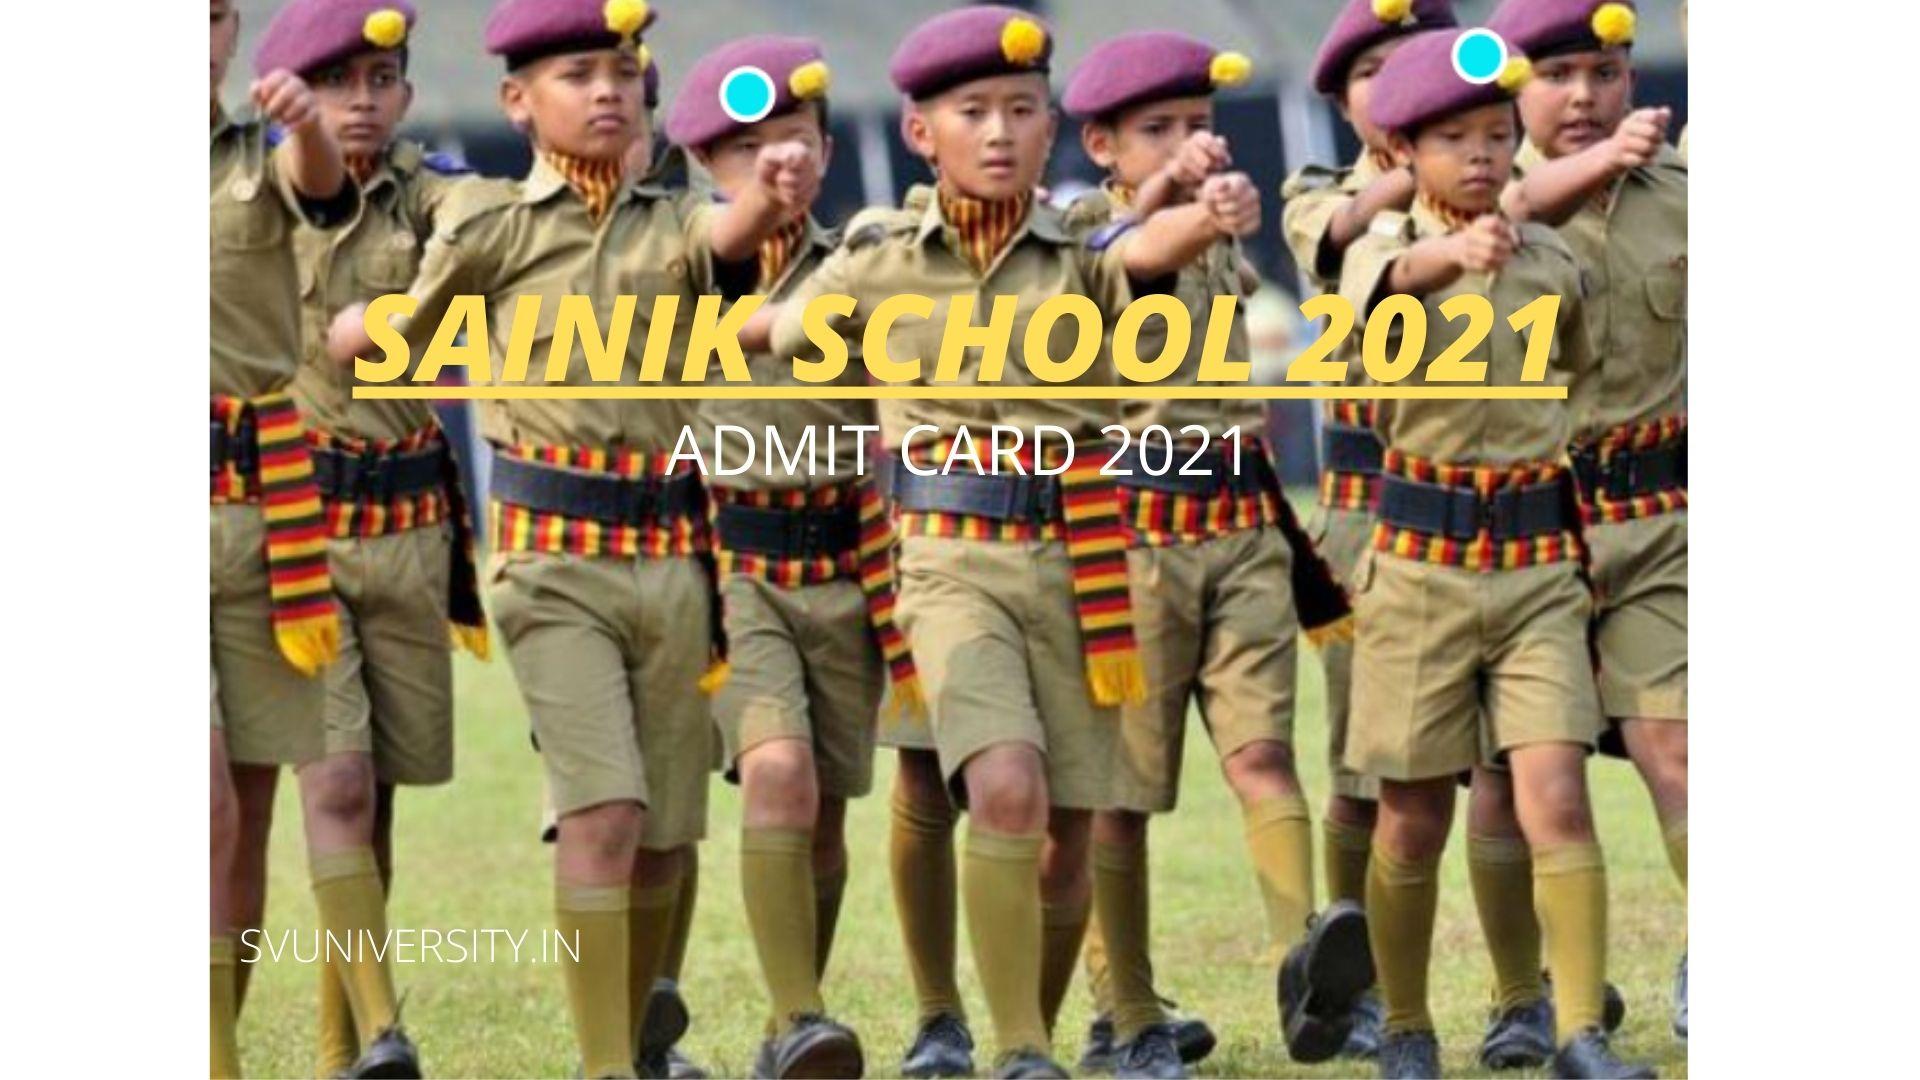 Sainik-School-Admit-Card